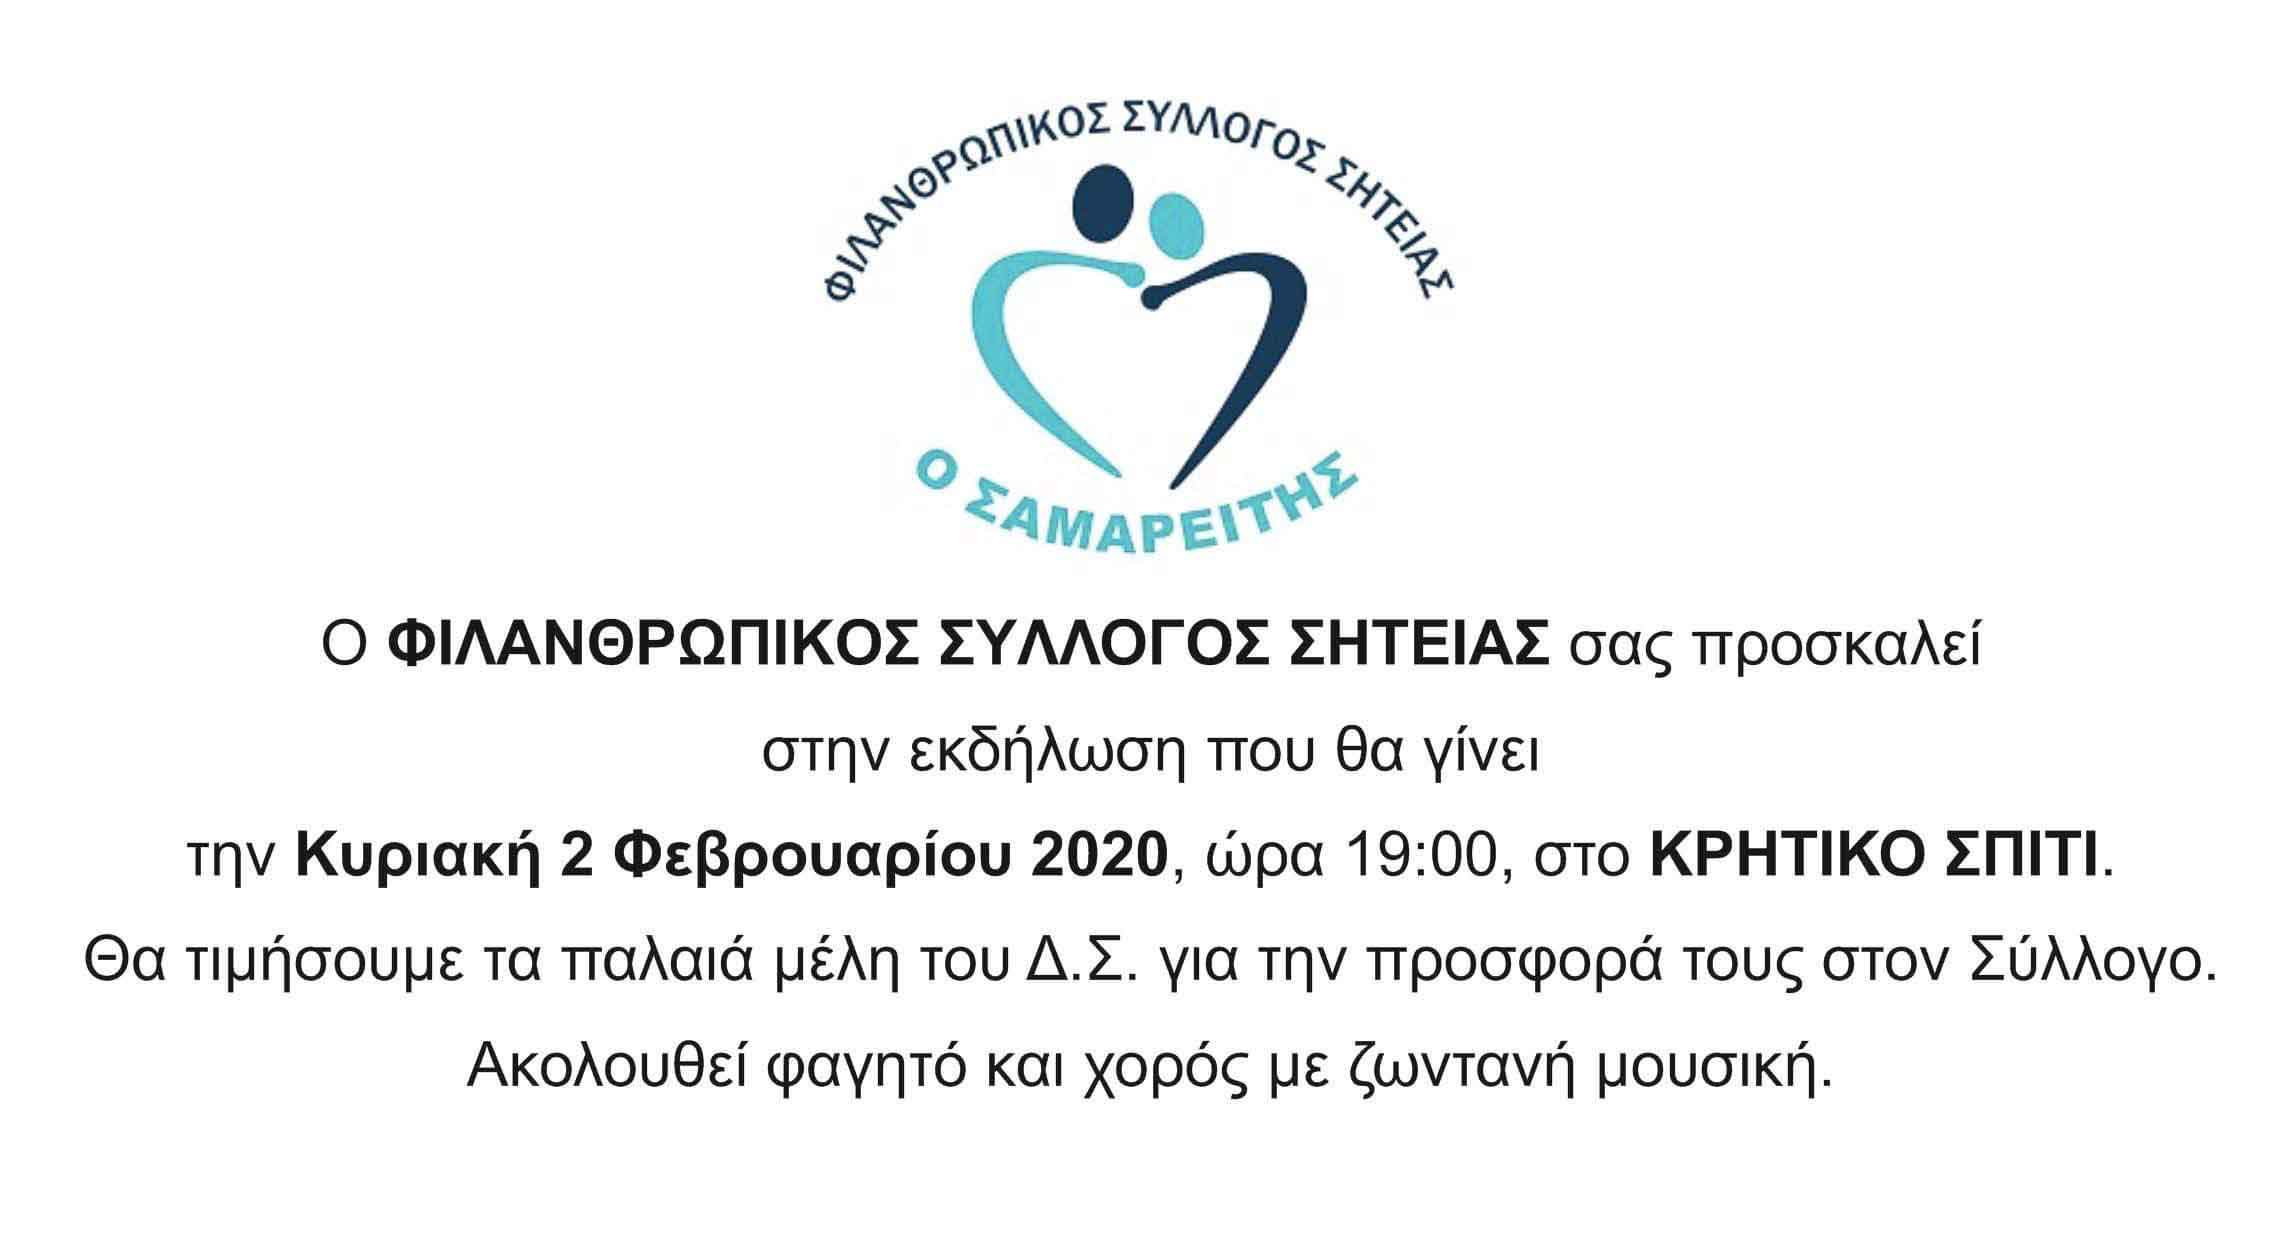 filanthropikos